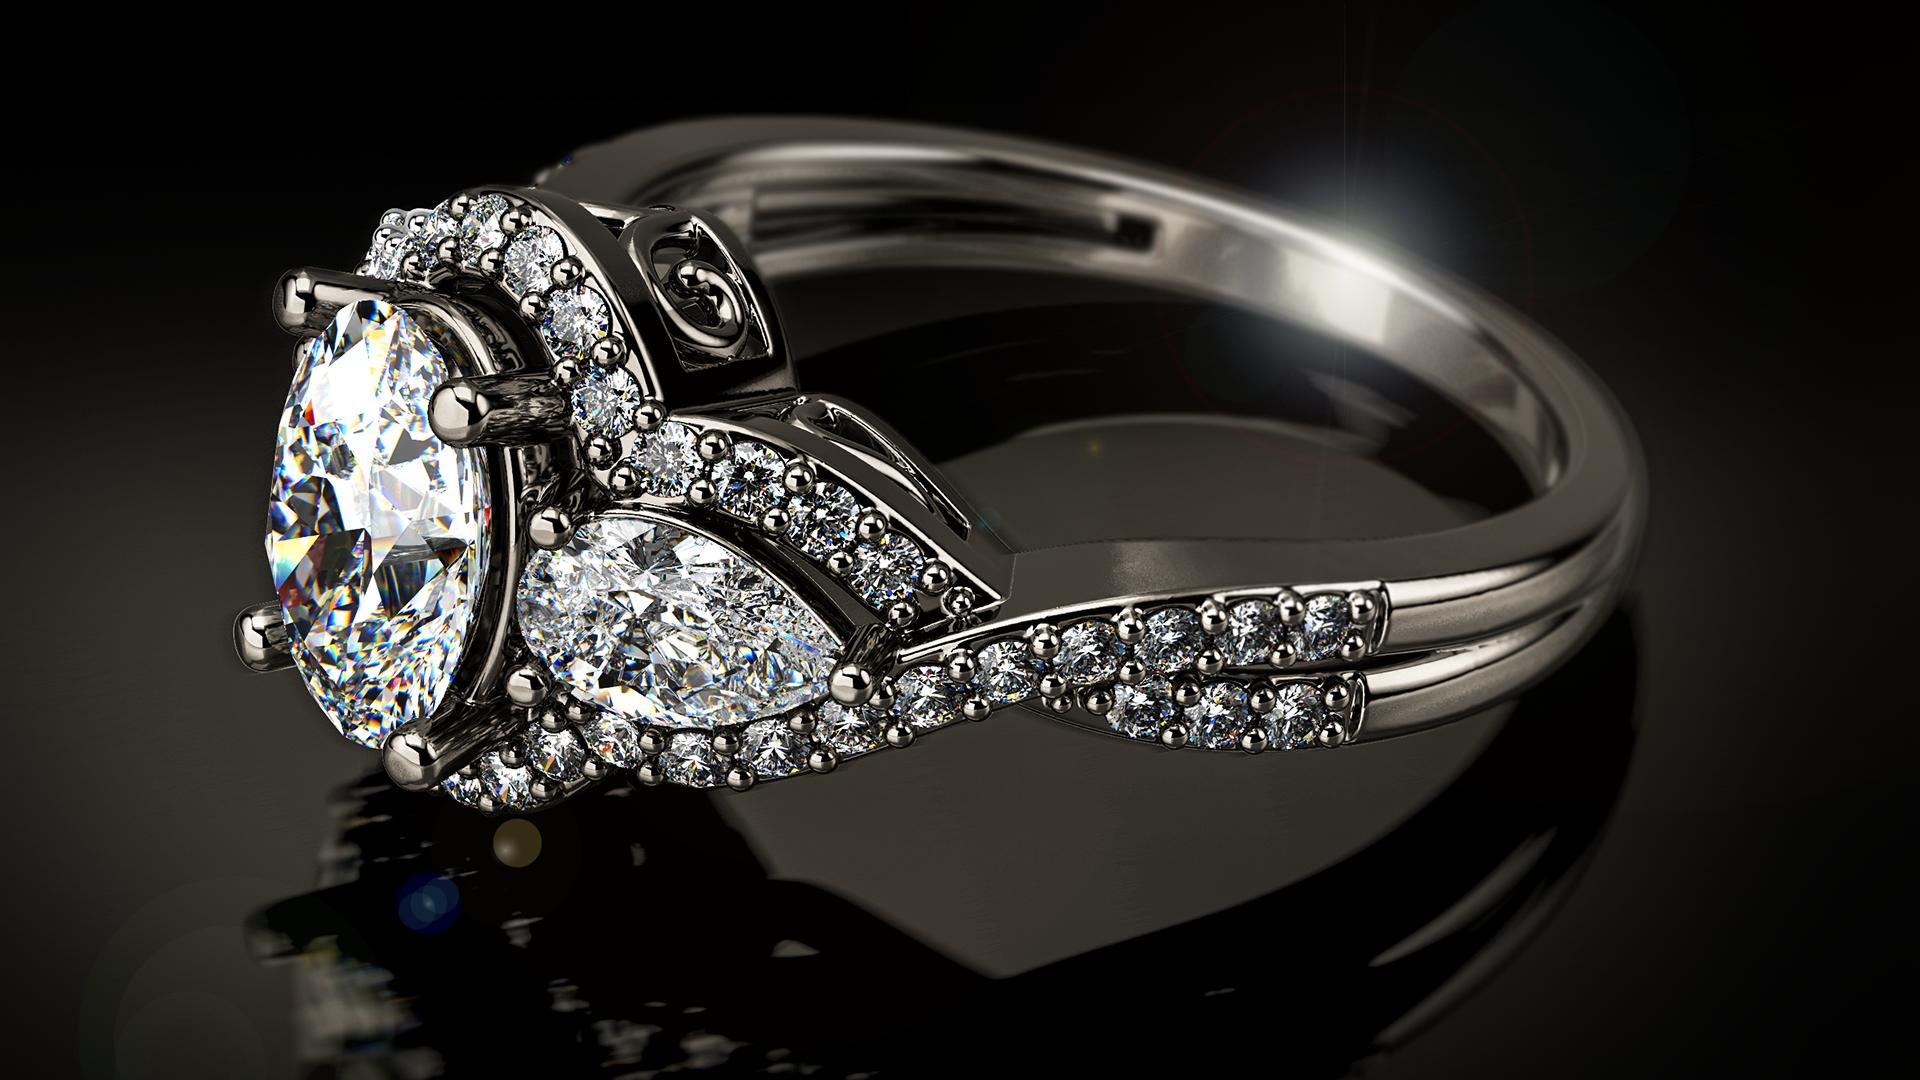 Cad Jewelry Design Classes Online